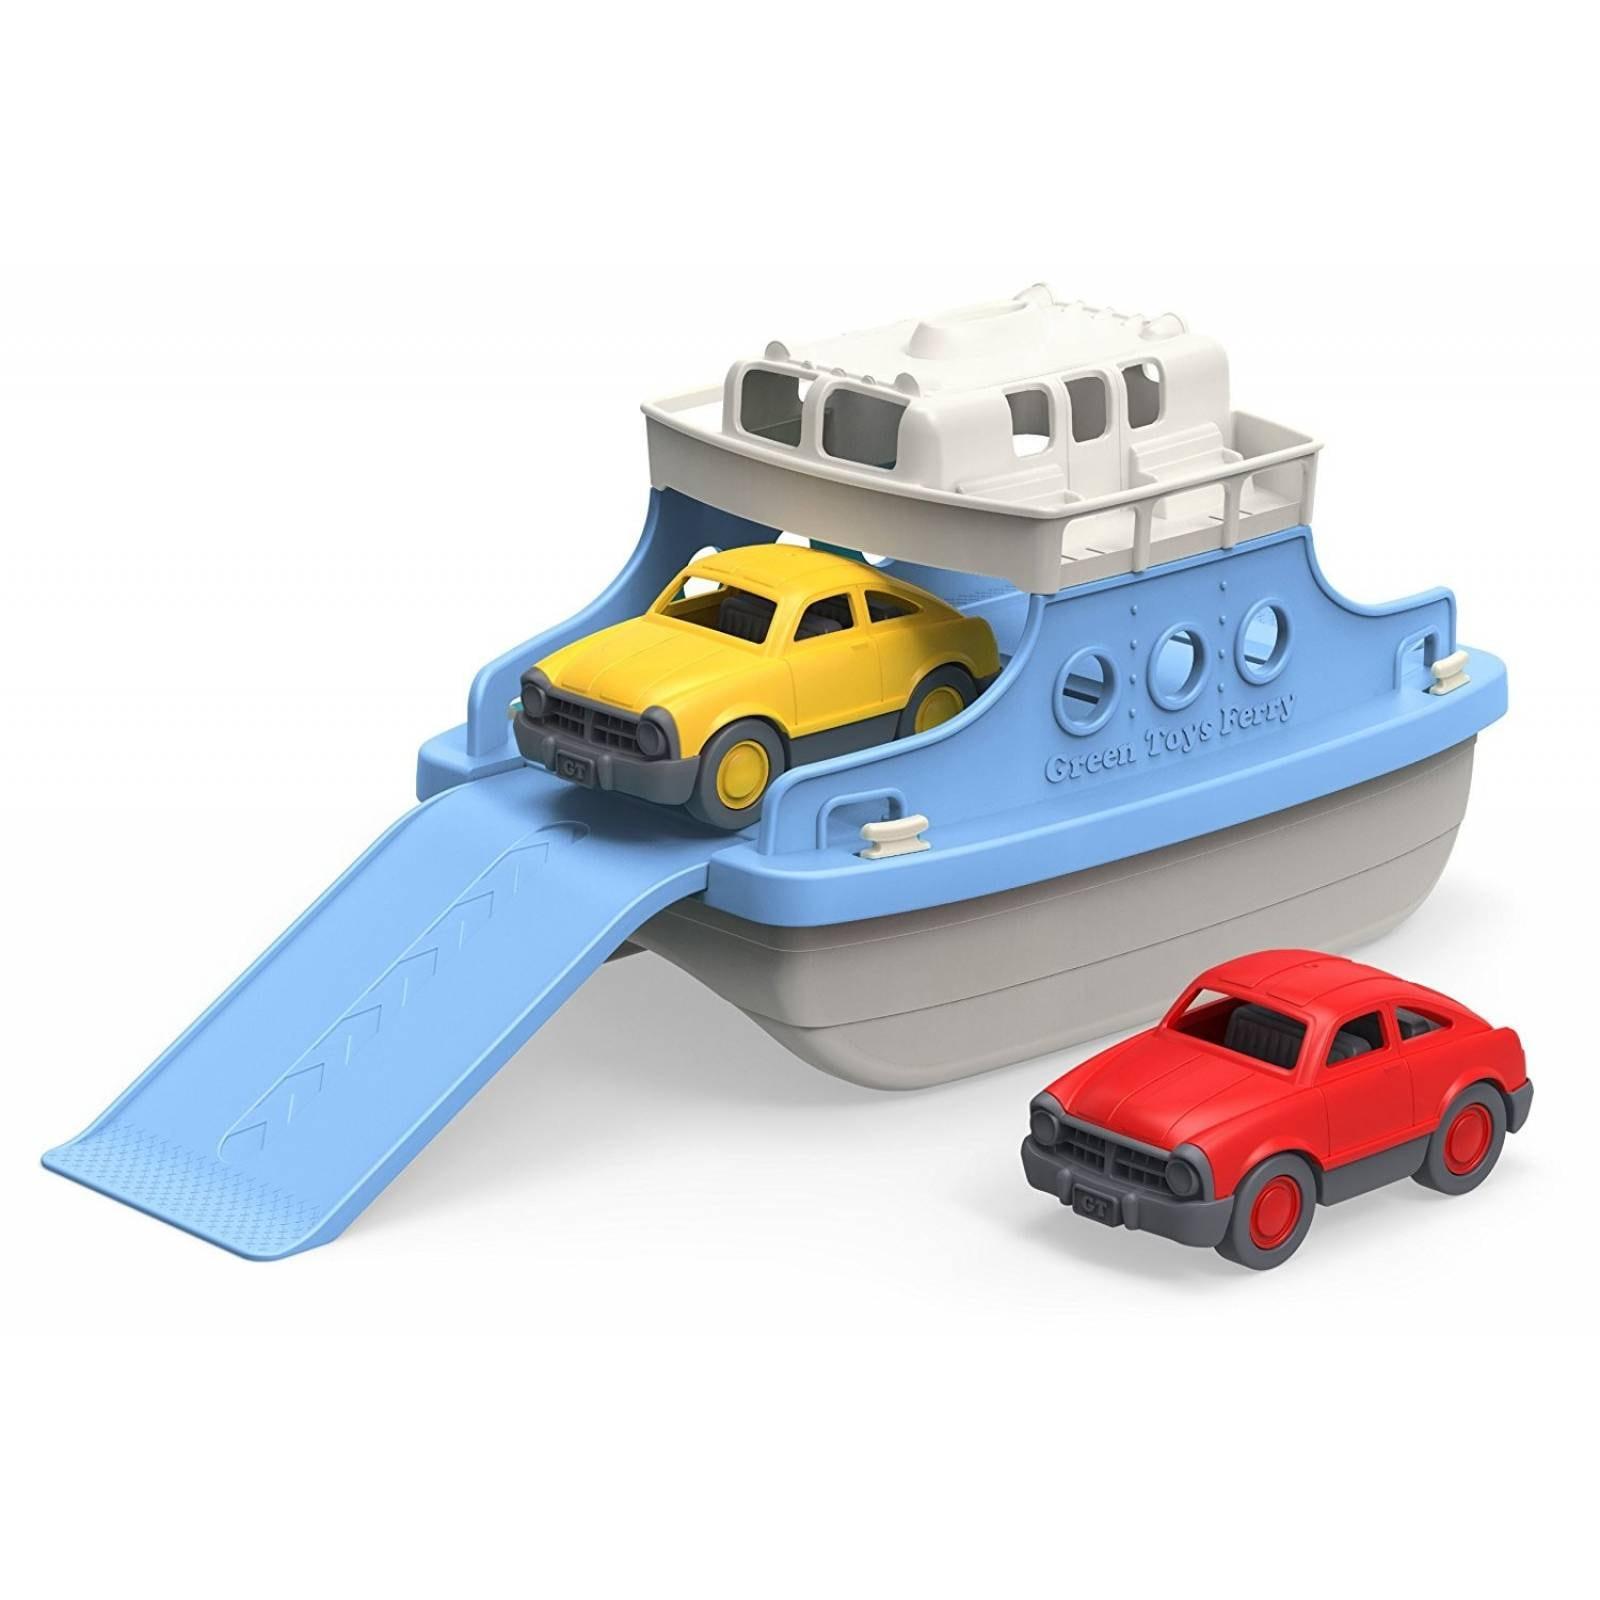 Green Baño Barquito De Juguete Bote Para Ferry Azul Toys pUzMGqSV